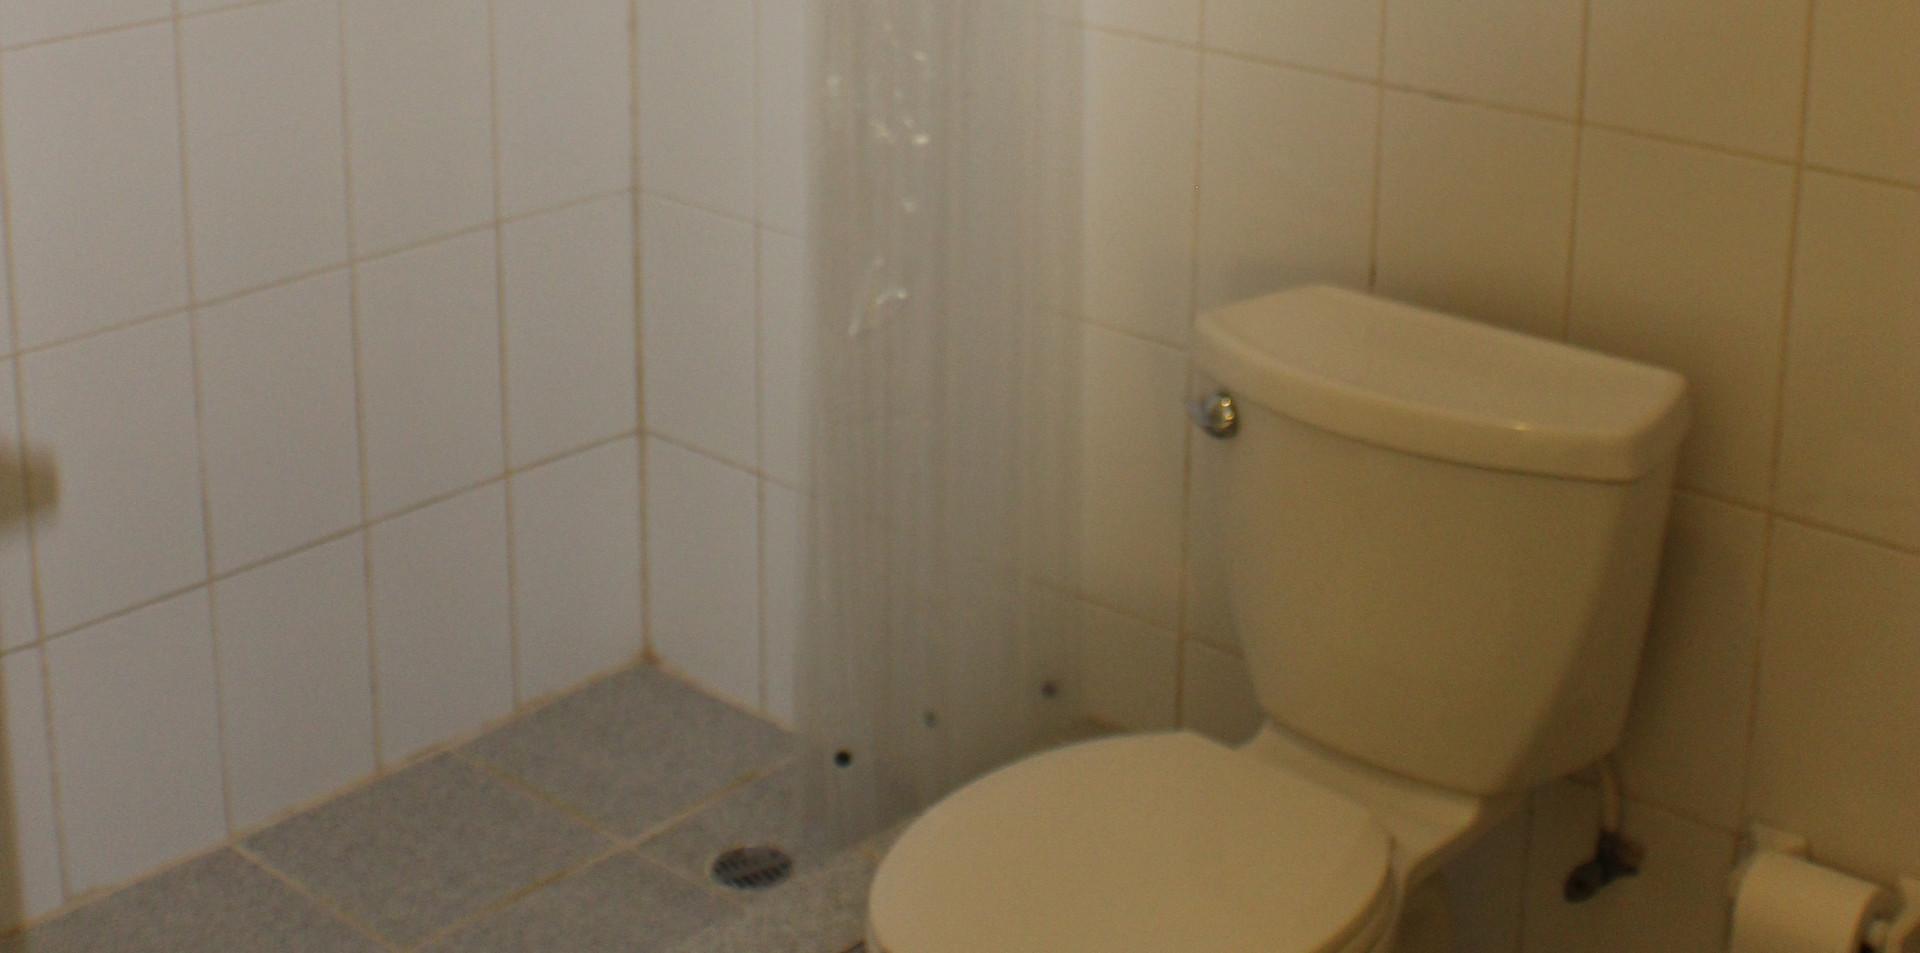 LOWER BEDROOM 1 BATH